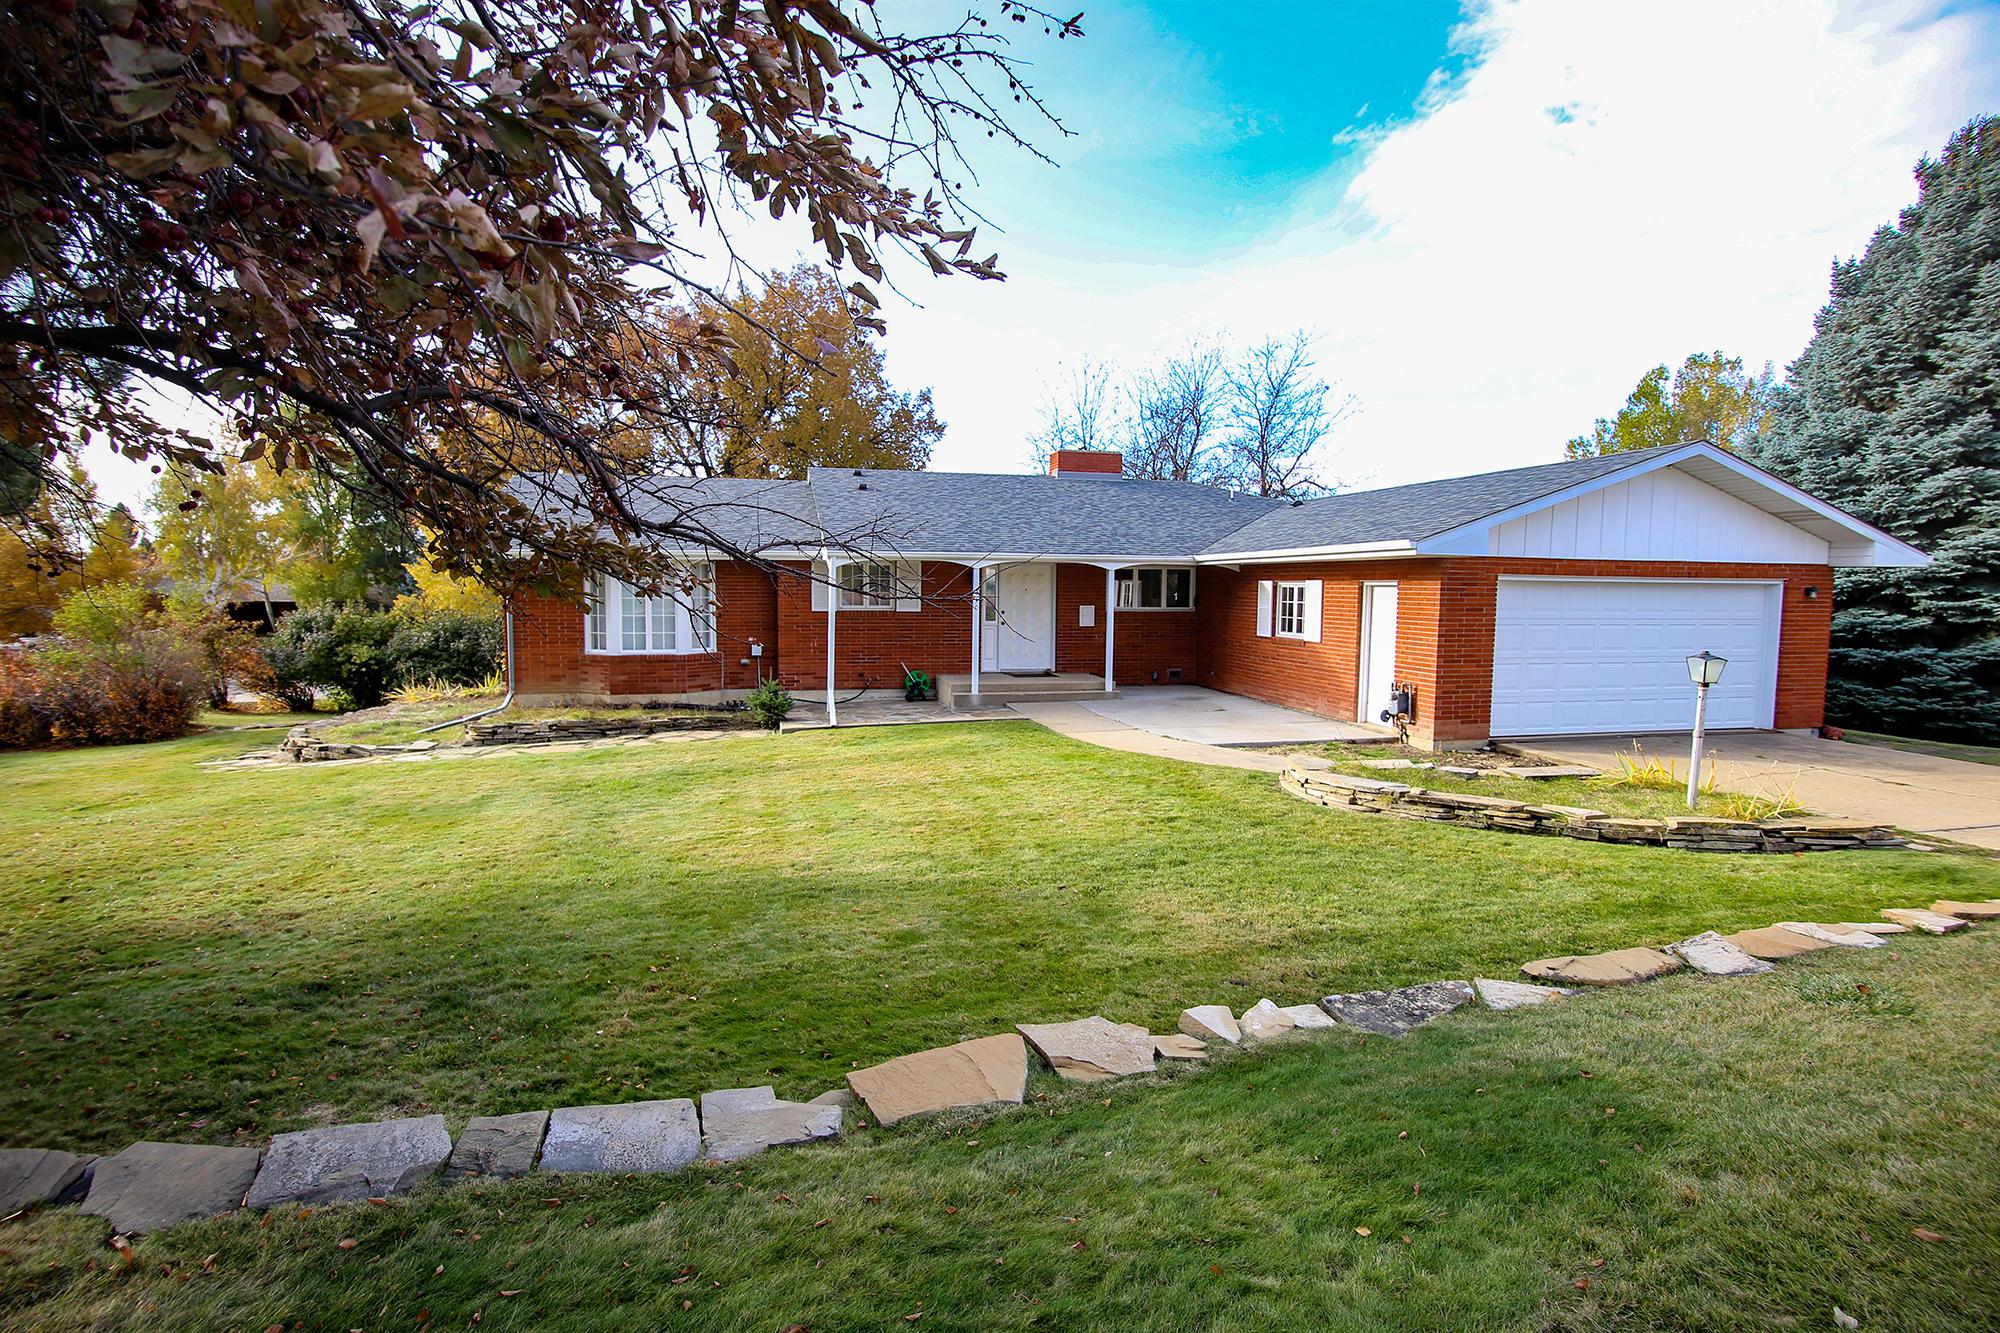 410 Crescent Drive, Sheridan, Wyoming 82801, 6 Bedrooms Bedrooms, ,3.5 BathroomsBathrooms,Residential,For Sale,Crescent,18-1117